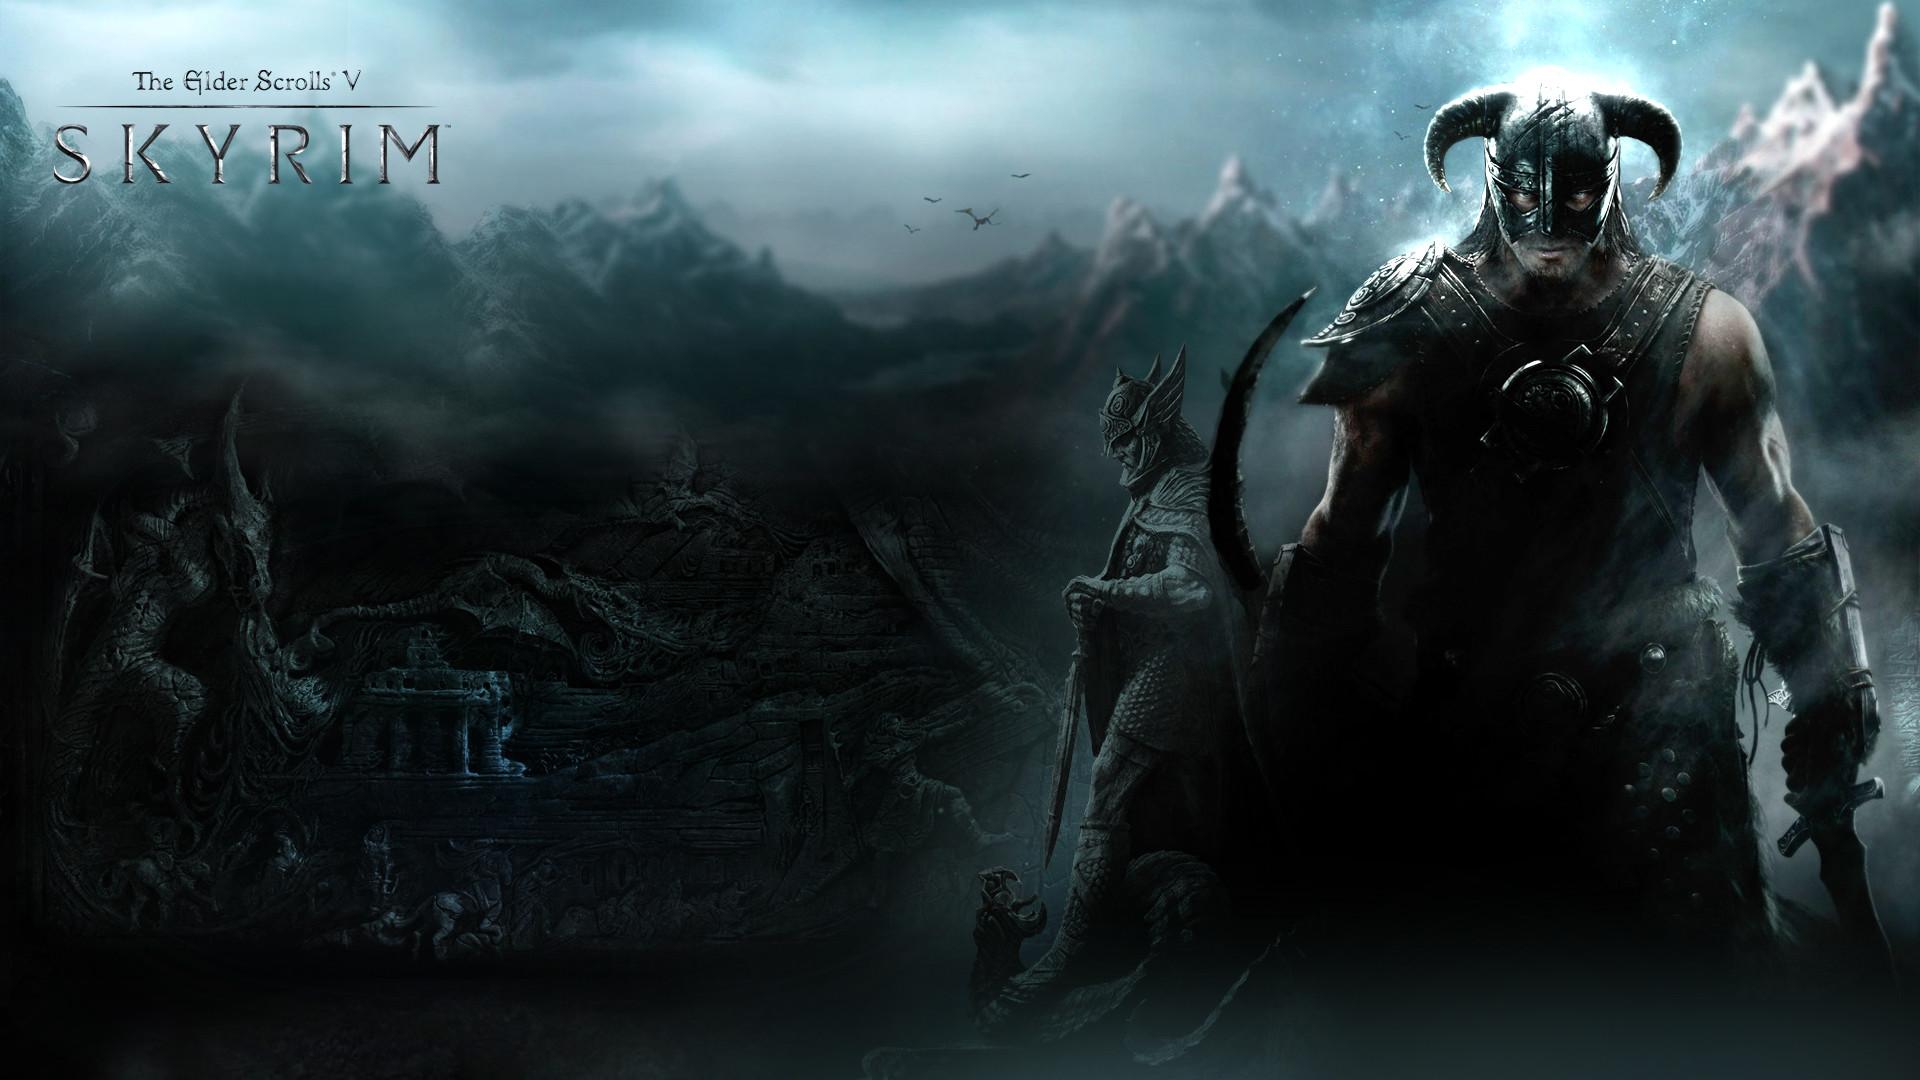 1920x1200 Computerspiele - The Elder Scrolls V: Skyrim Wings Skyrim Horns Drachen Wallpaper